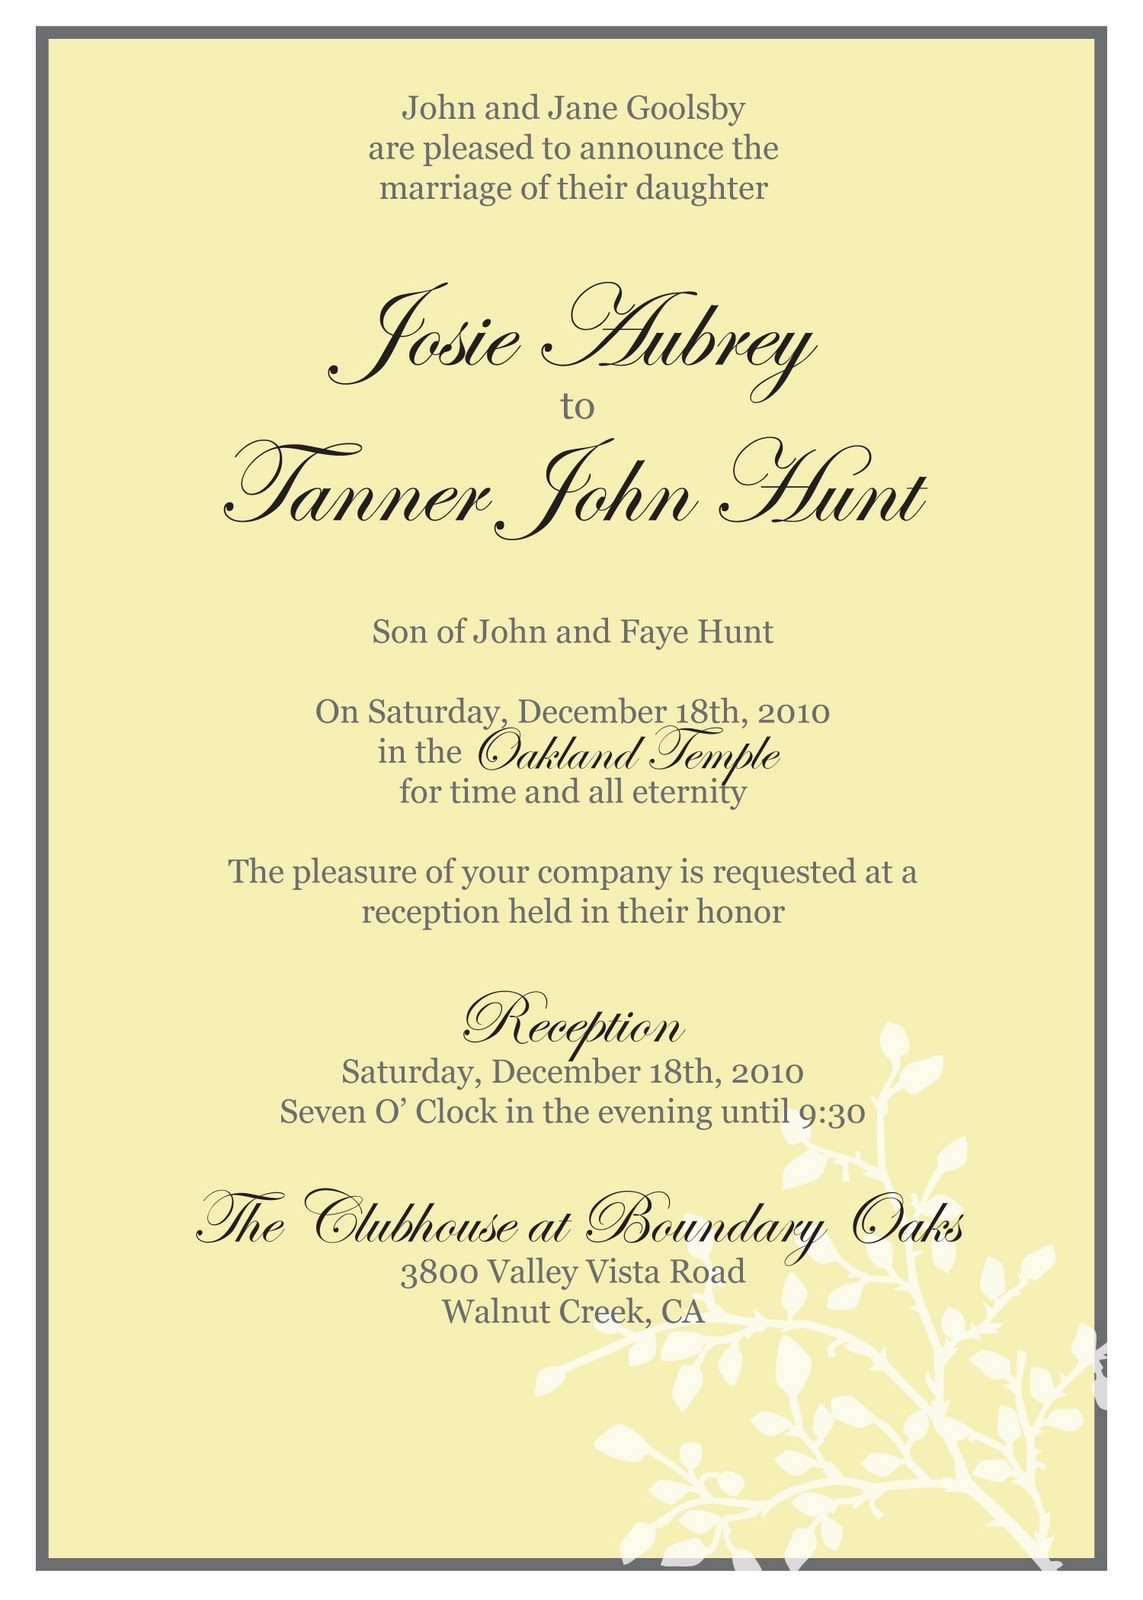 wedding: My Brother Wedding Invitation Message To Friends